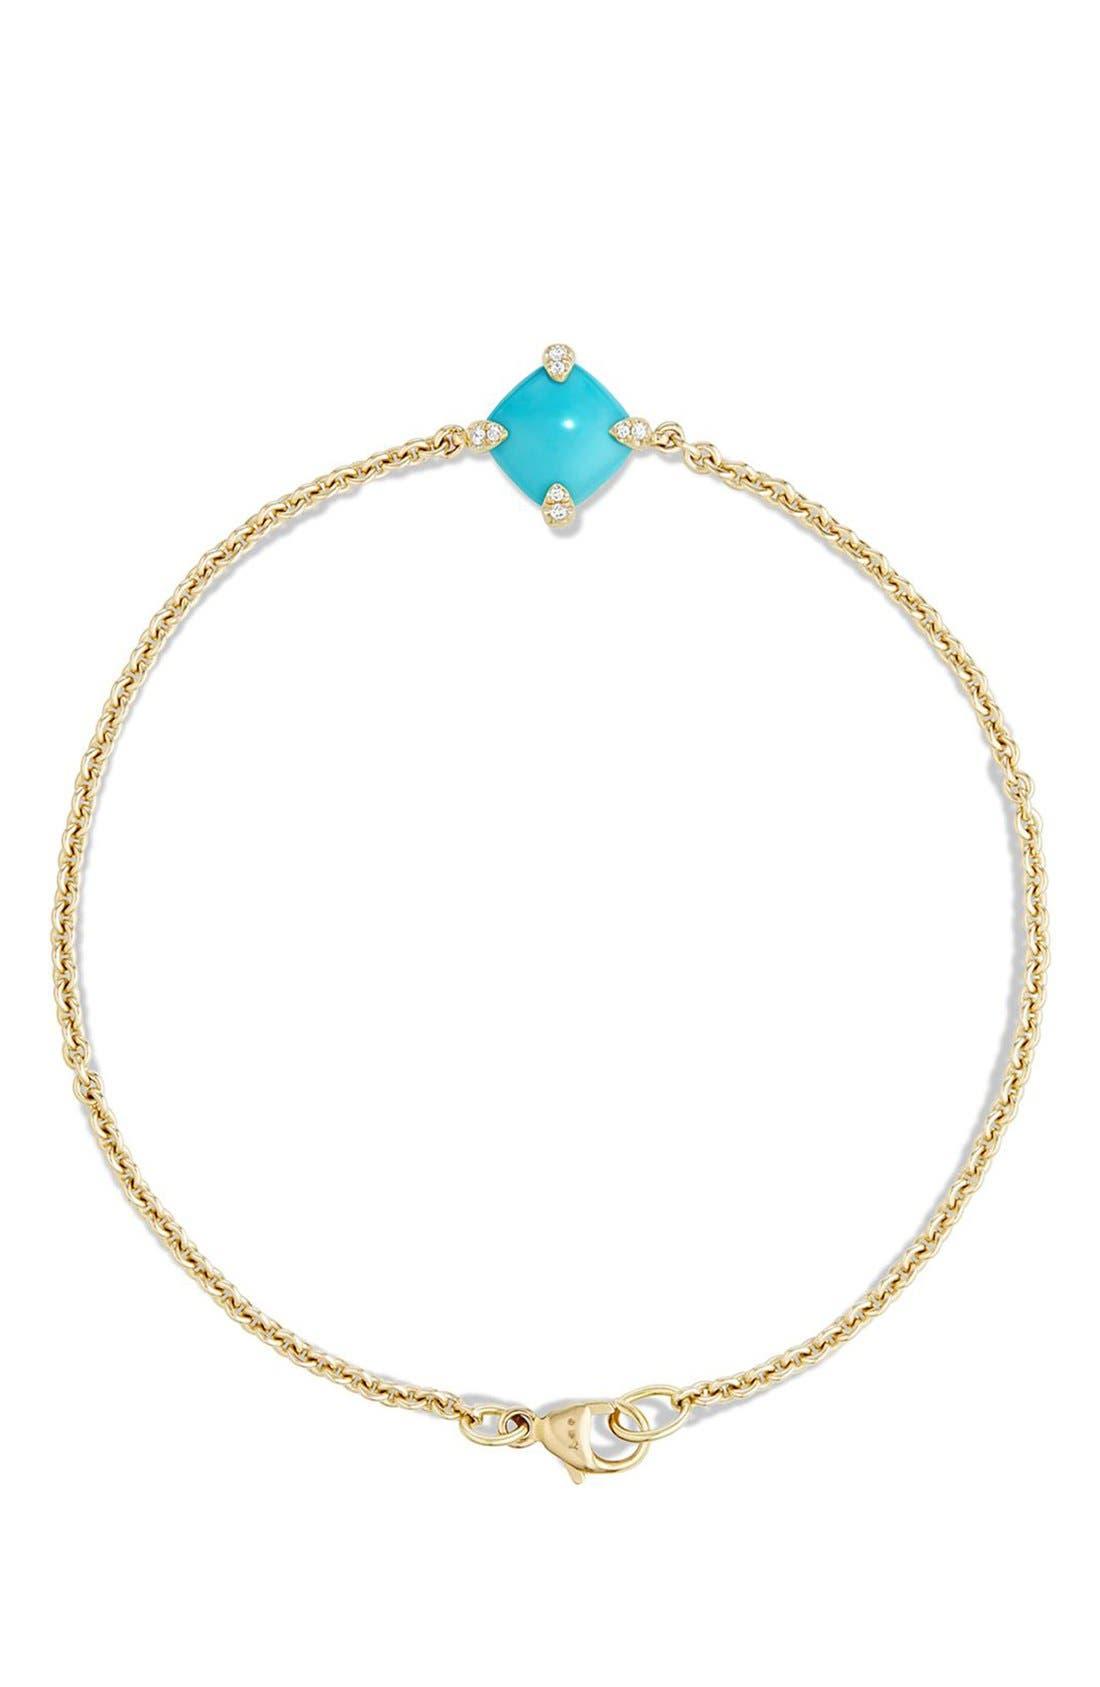 DAVID YURMAN, 'Châtelaine' Bracelet with Diamonds in 18K Gold, Alternate thumbnail 3, color, TURQUOISE